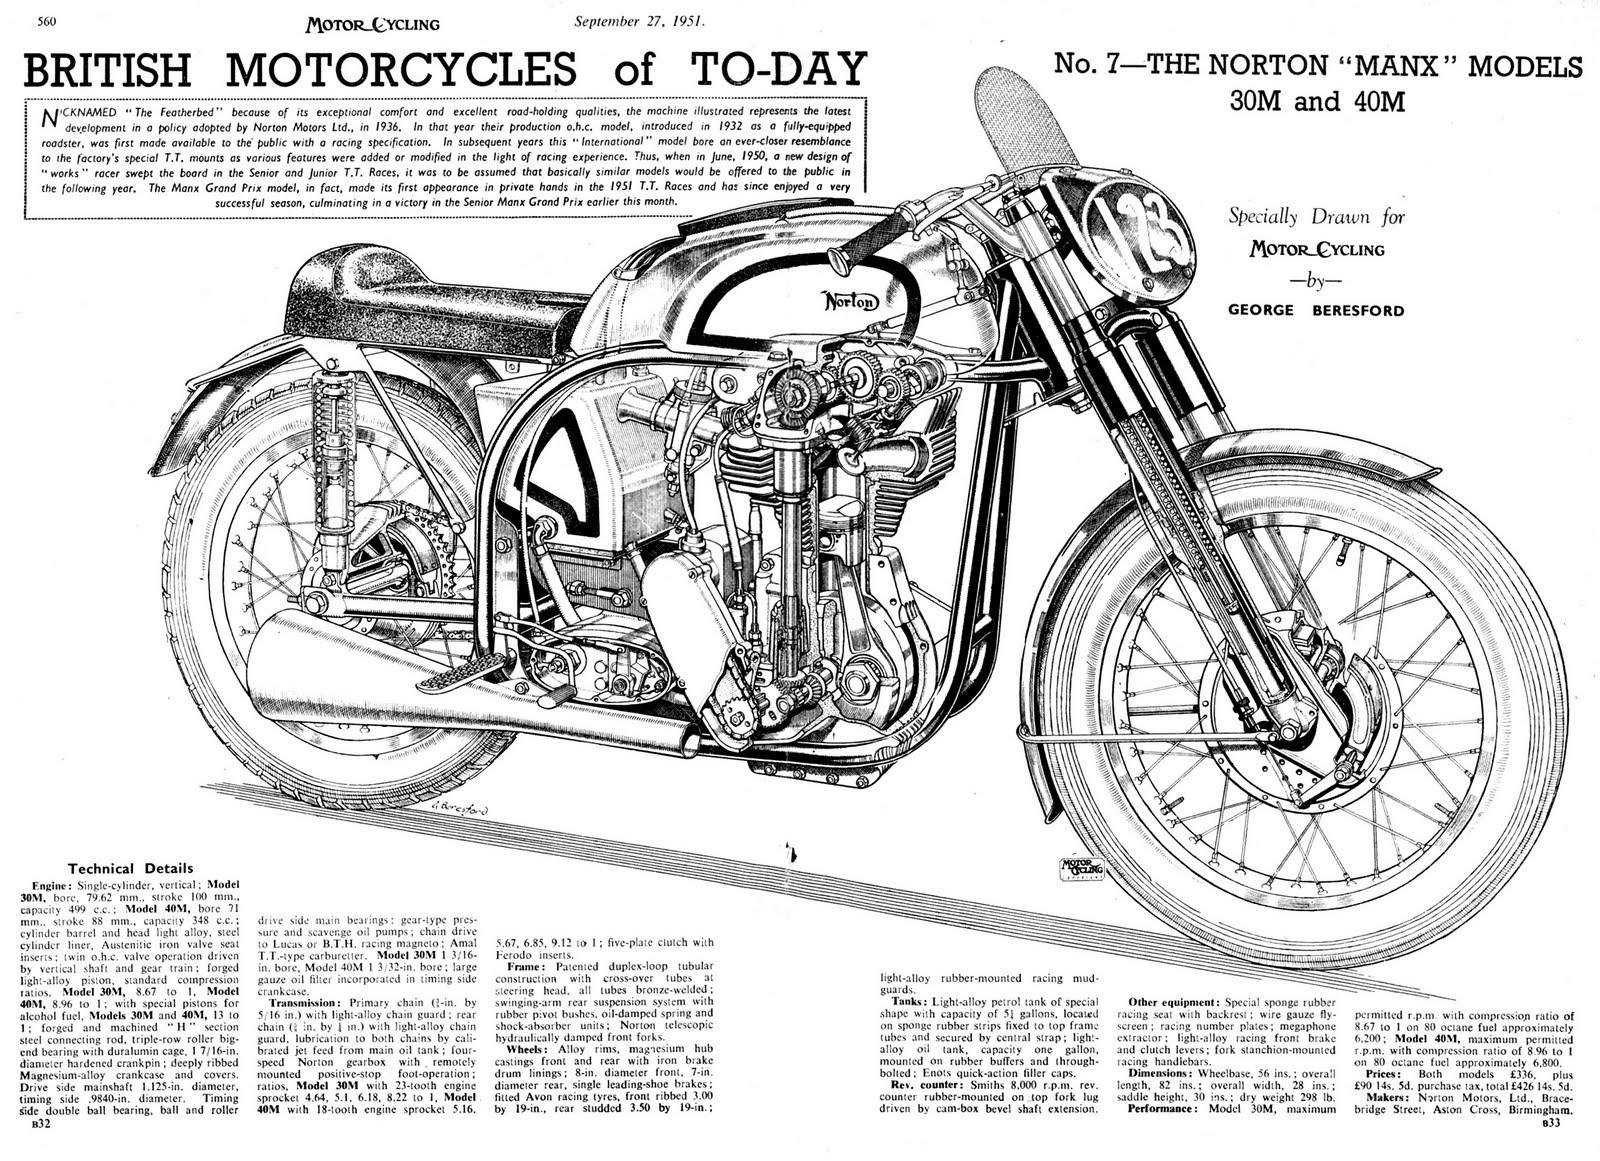 Norton Manx Motorcycle Cutaway